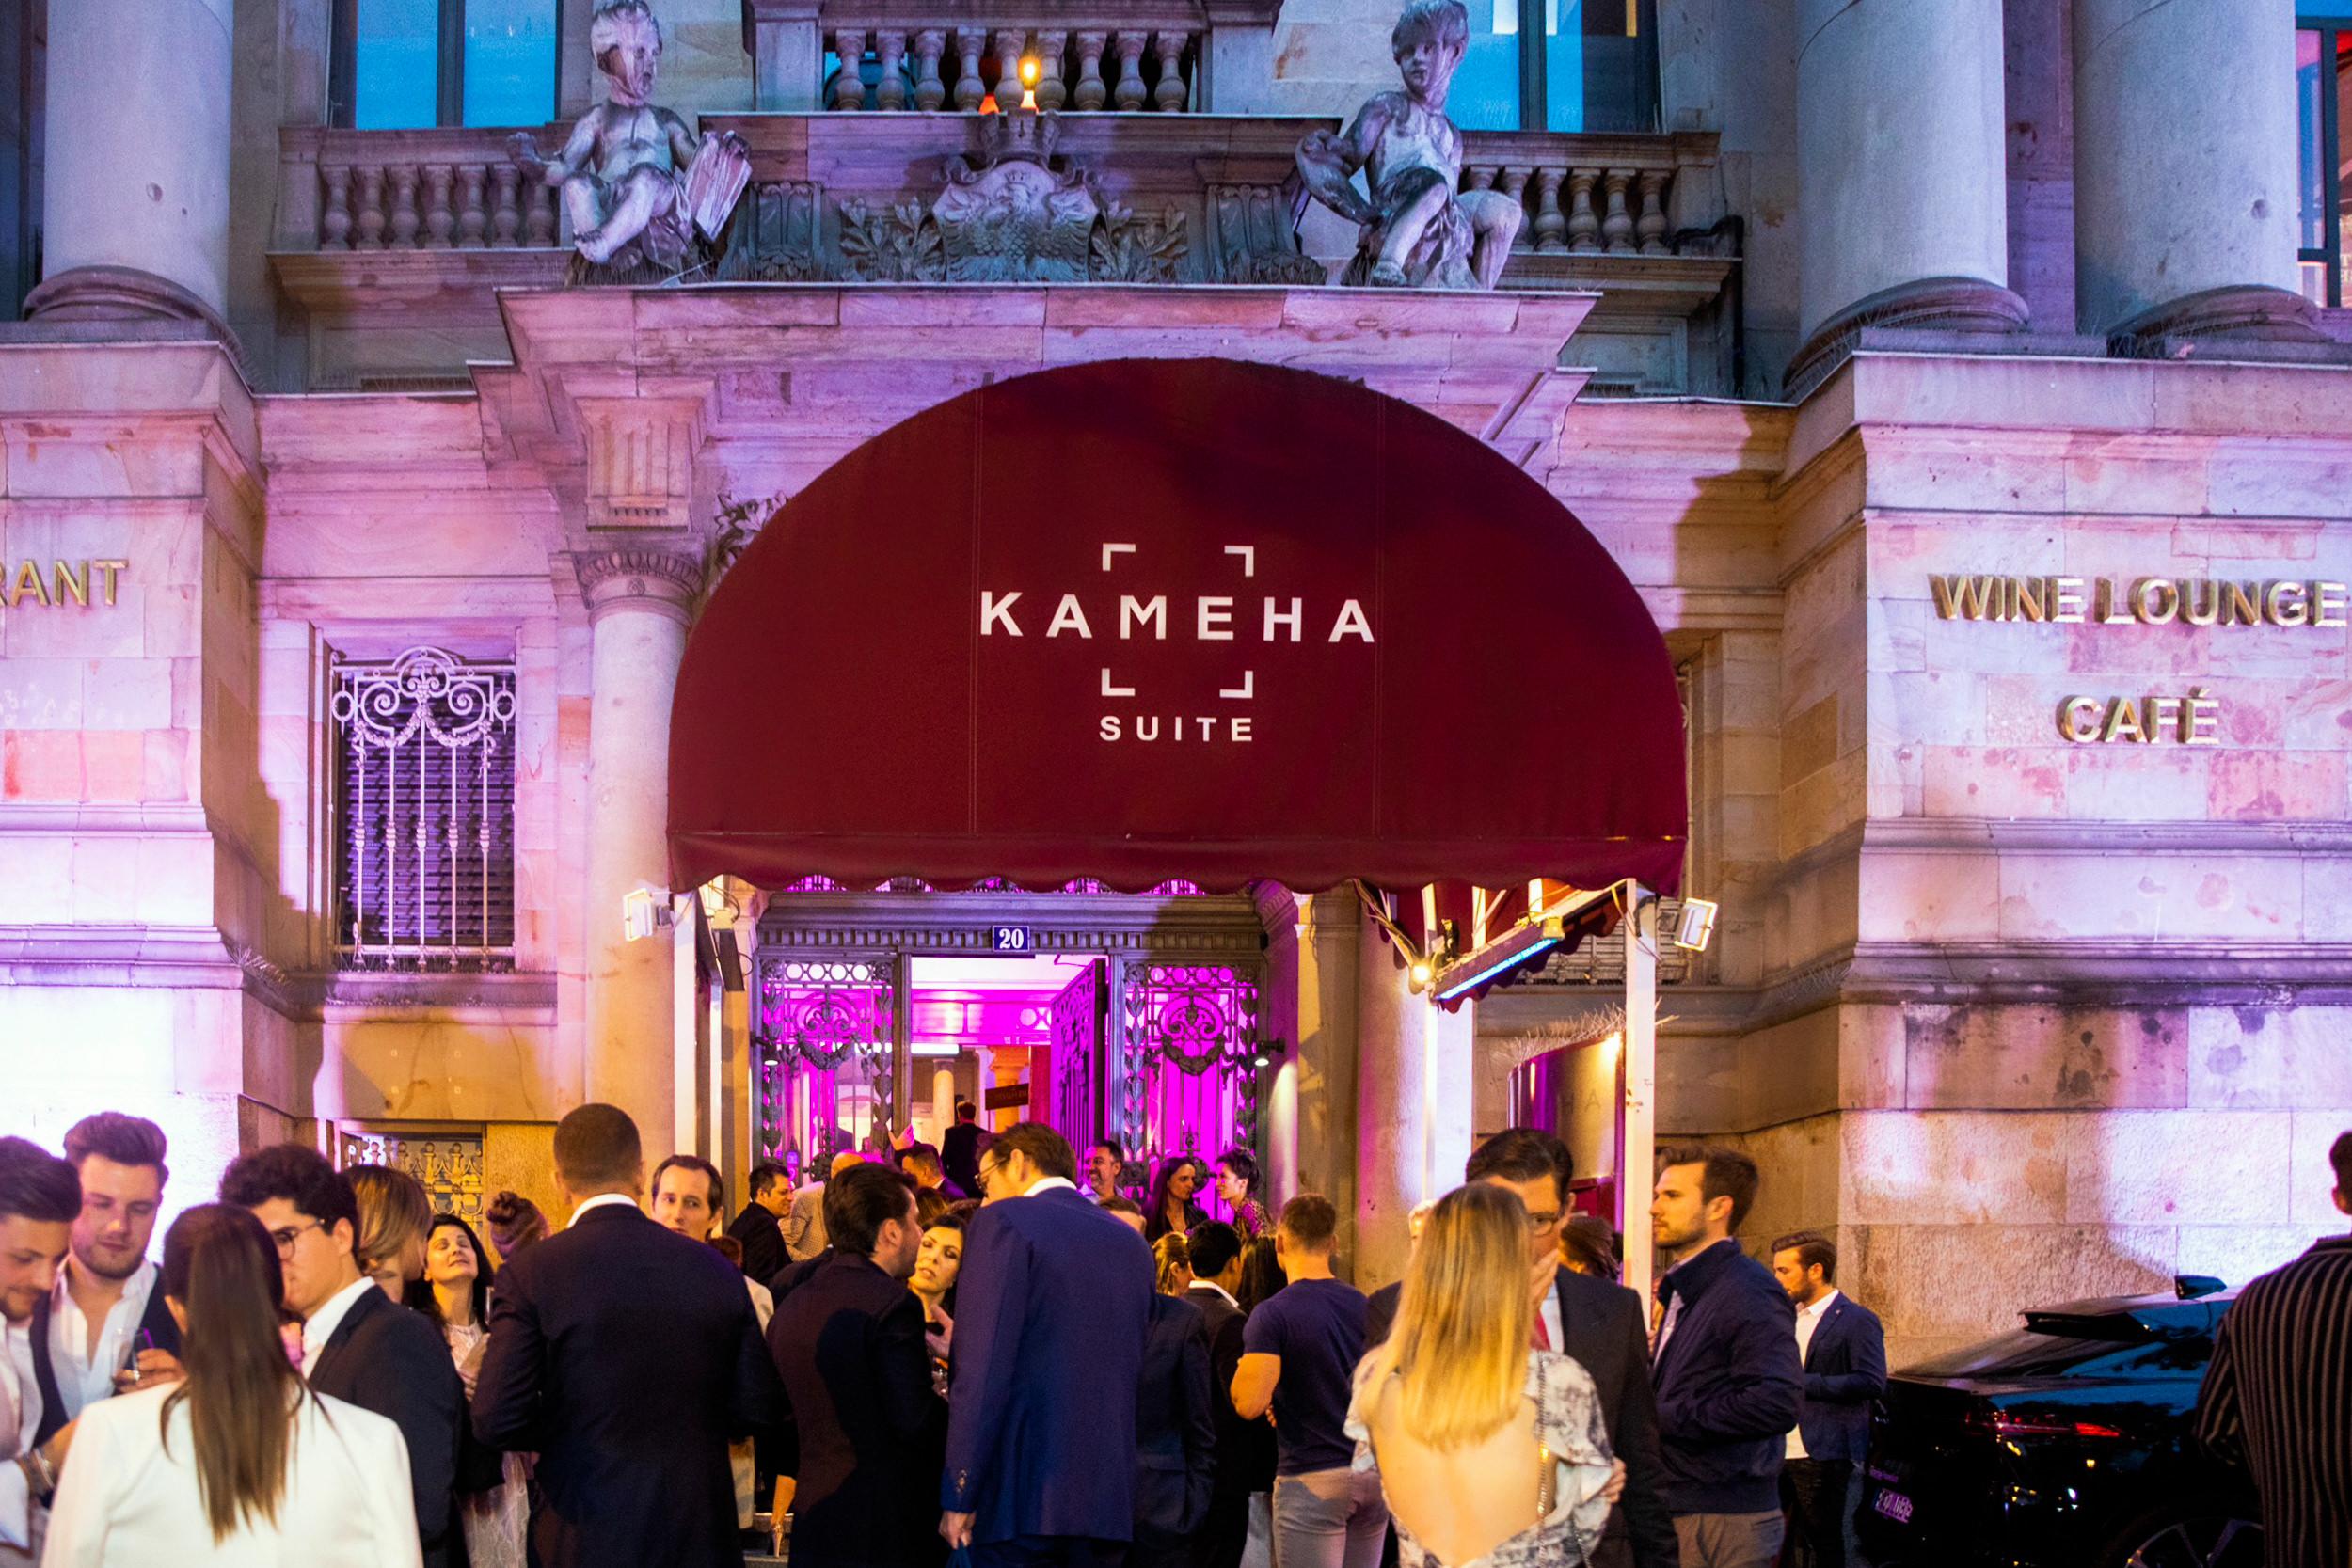 the frankfurter gala kameha suite 6